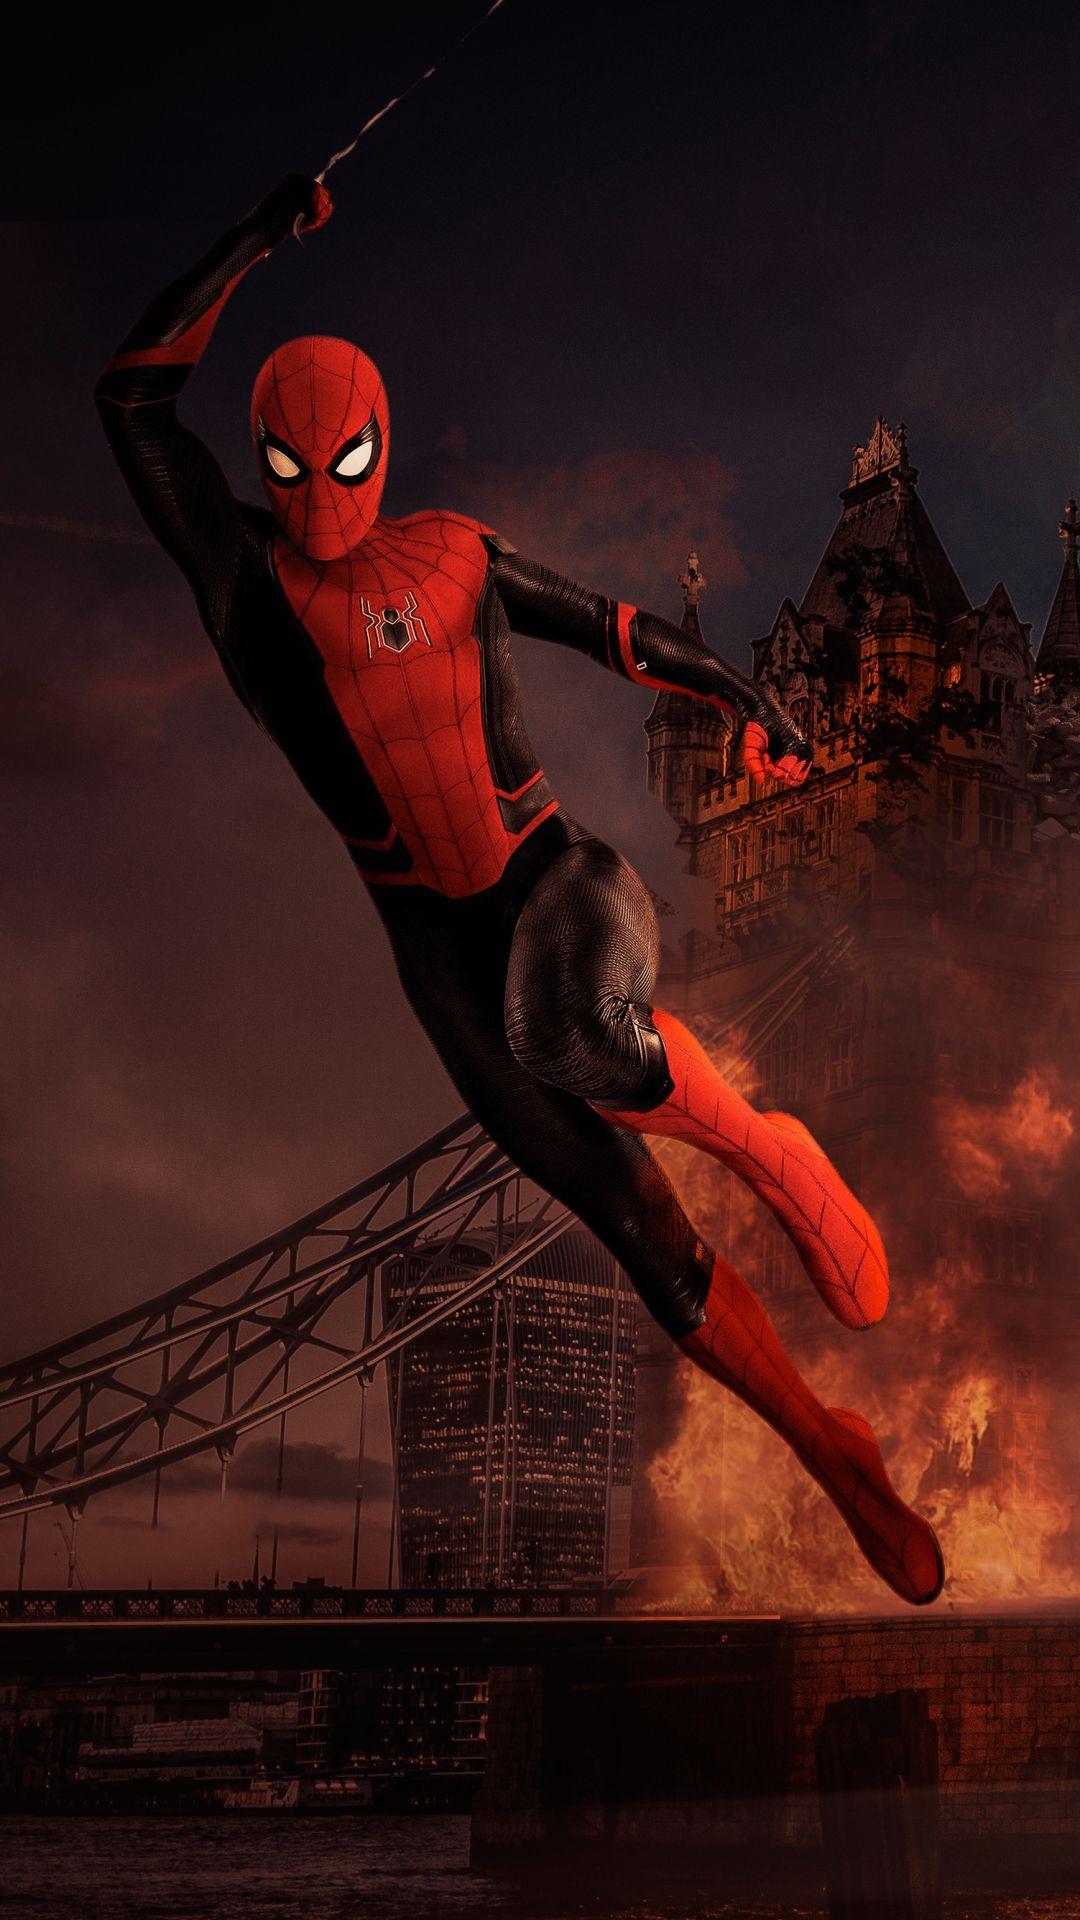 Spiderman Wallpaper For Fire Tablet